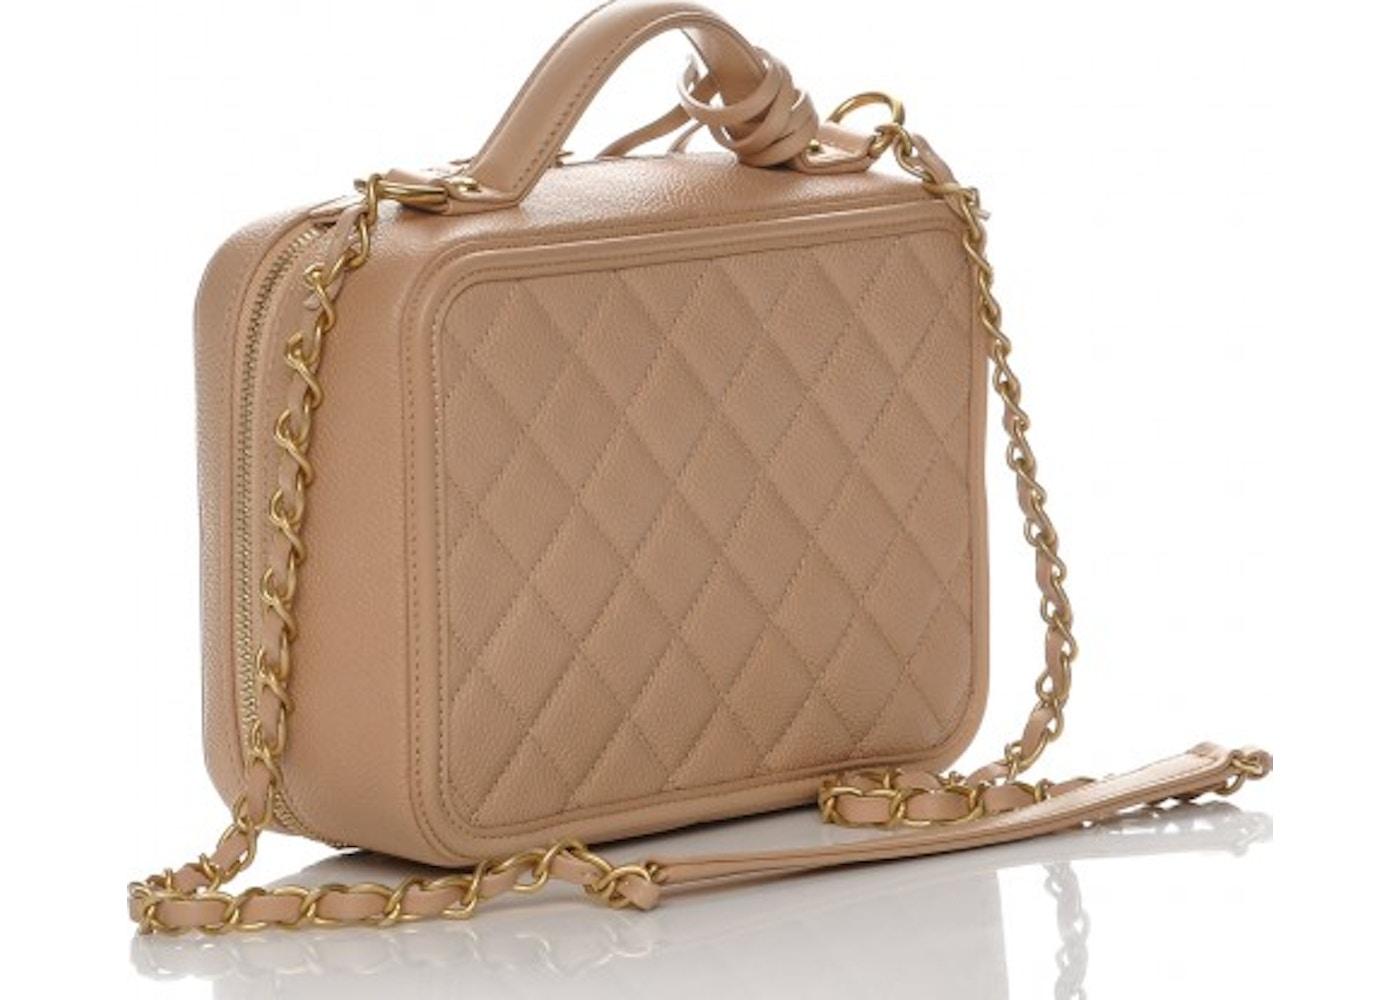 7cd737c5596d Chanel Vanity Case Diamond Quilted CC Filigree Medium Beige